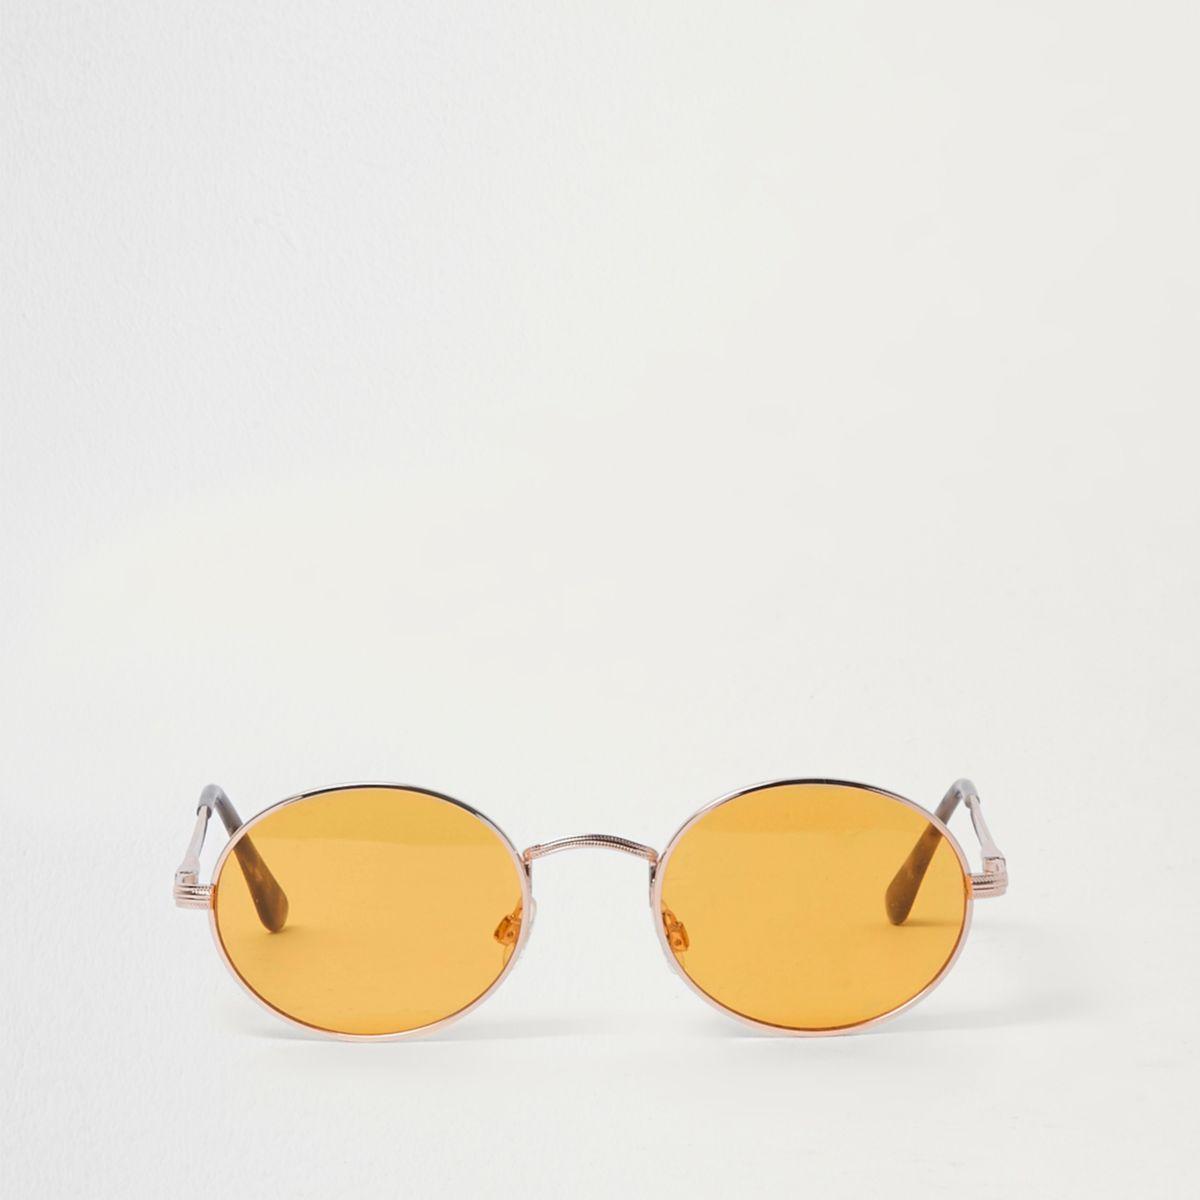 Goudkleurige zonnebril met ovale gele glazen